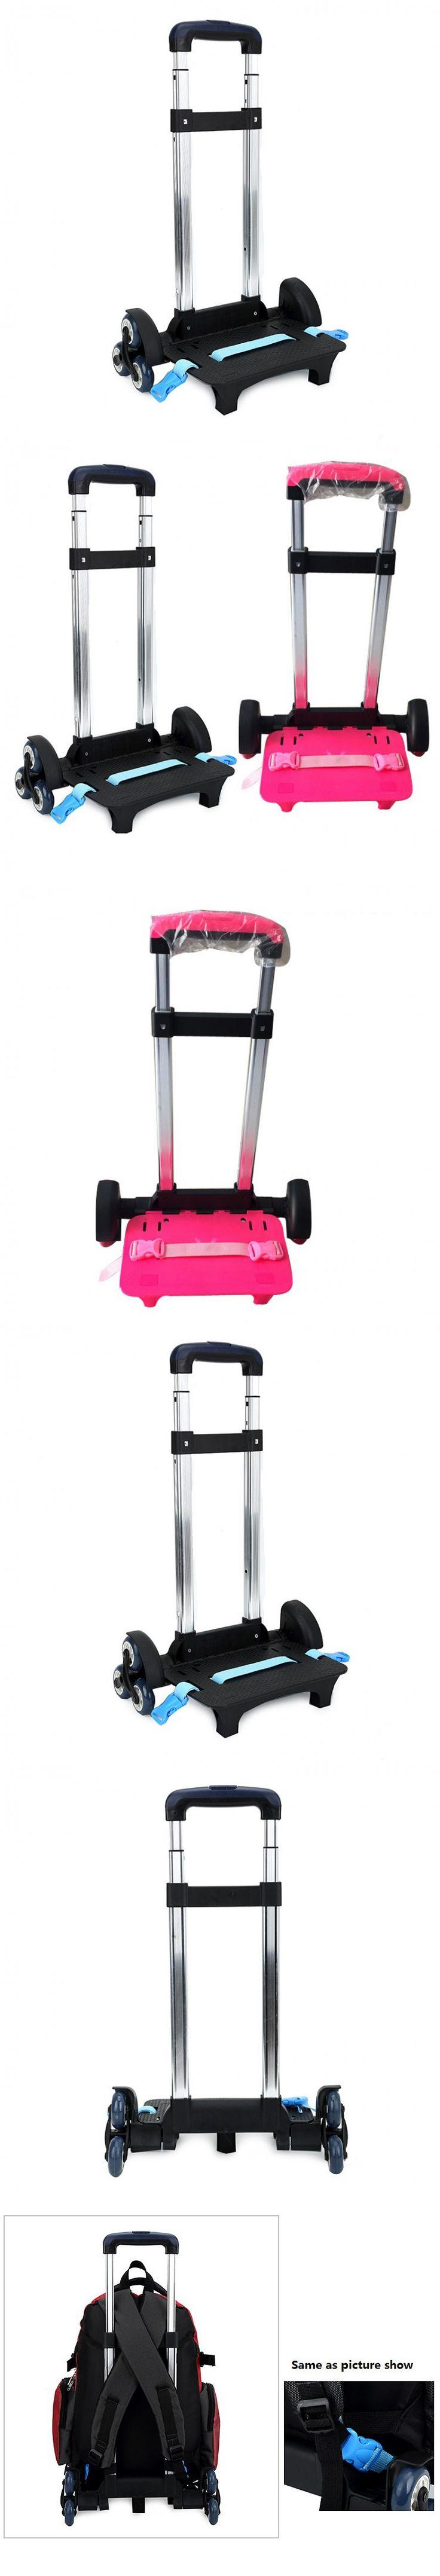 3 Wheel Fold Pull Rod Bracket Roll Cart Trolley School Bags easy climb the stairs,mochila infantil rodinha mochilas school kids